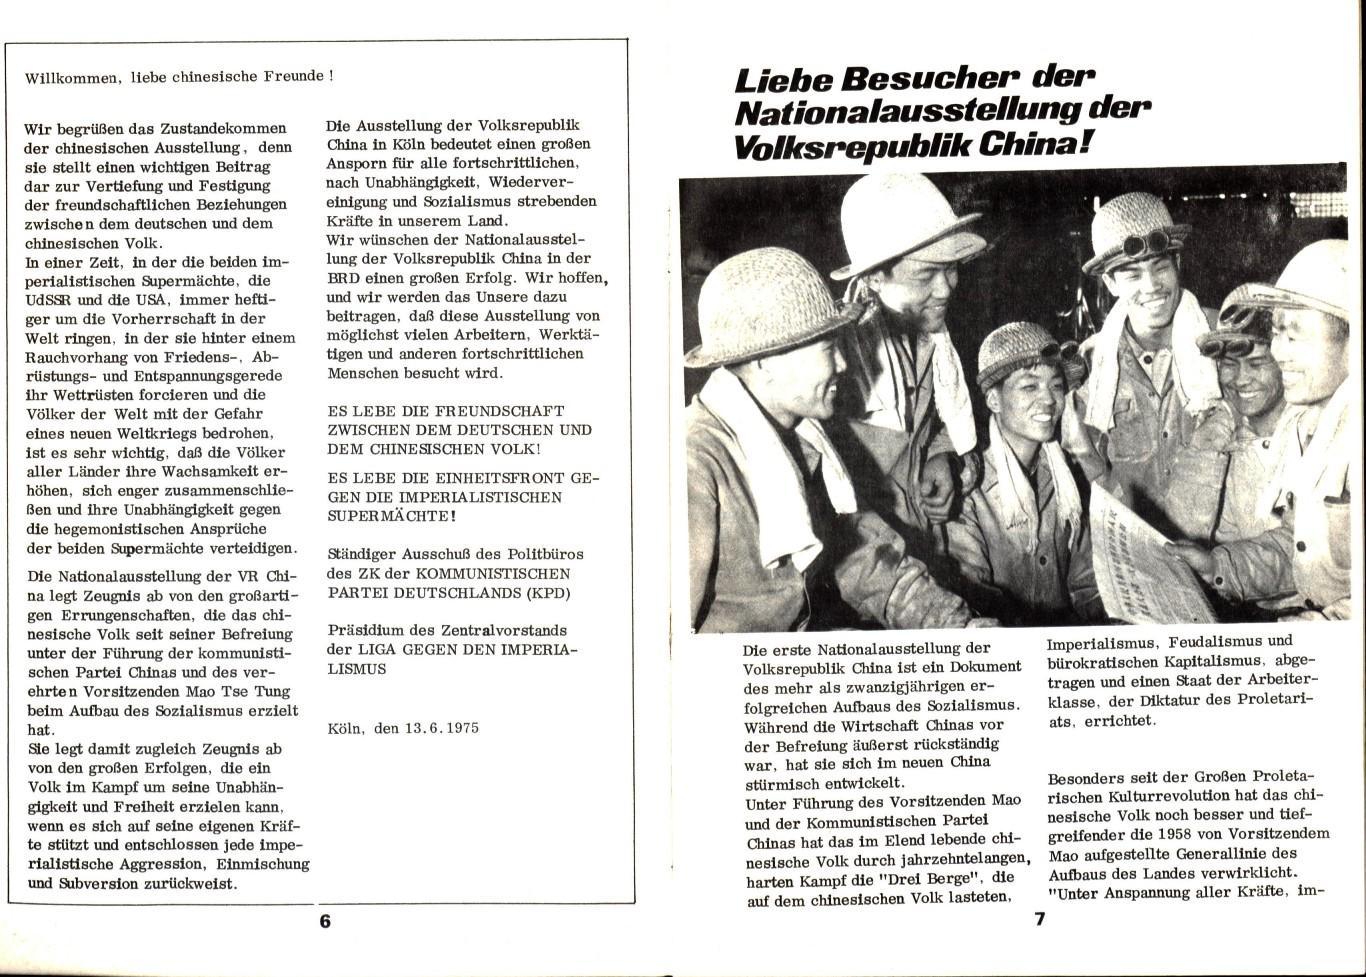 KPDAO_1975_Nationalausstellung_VRCh_in_Koeln_04